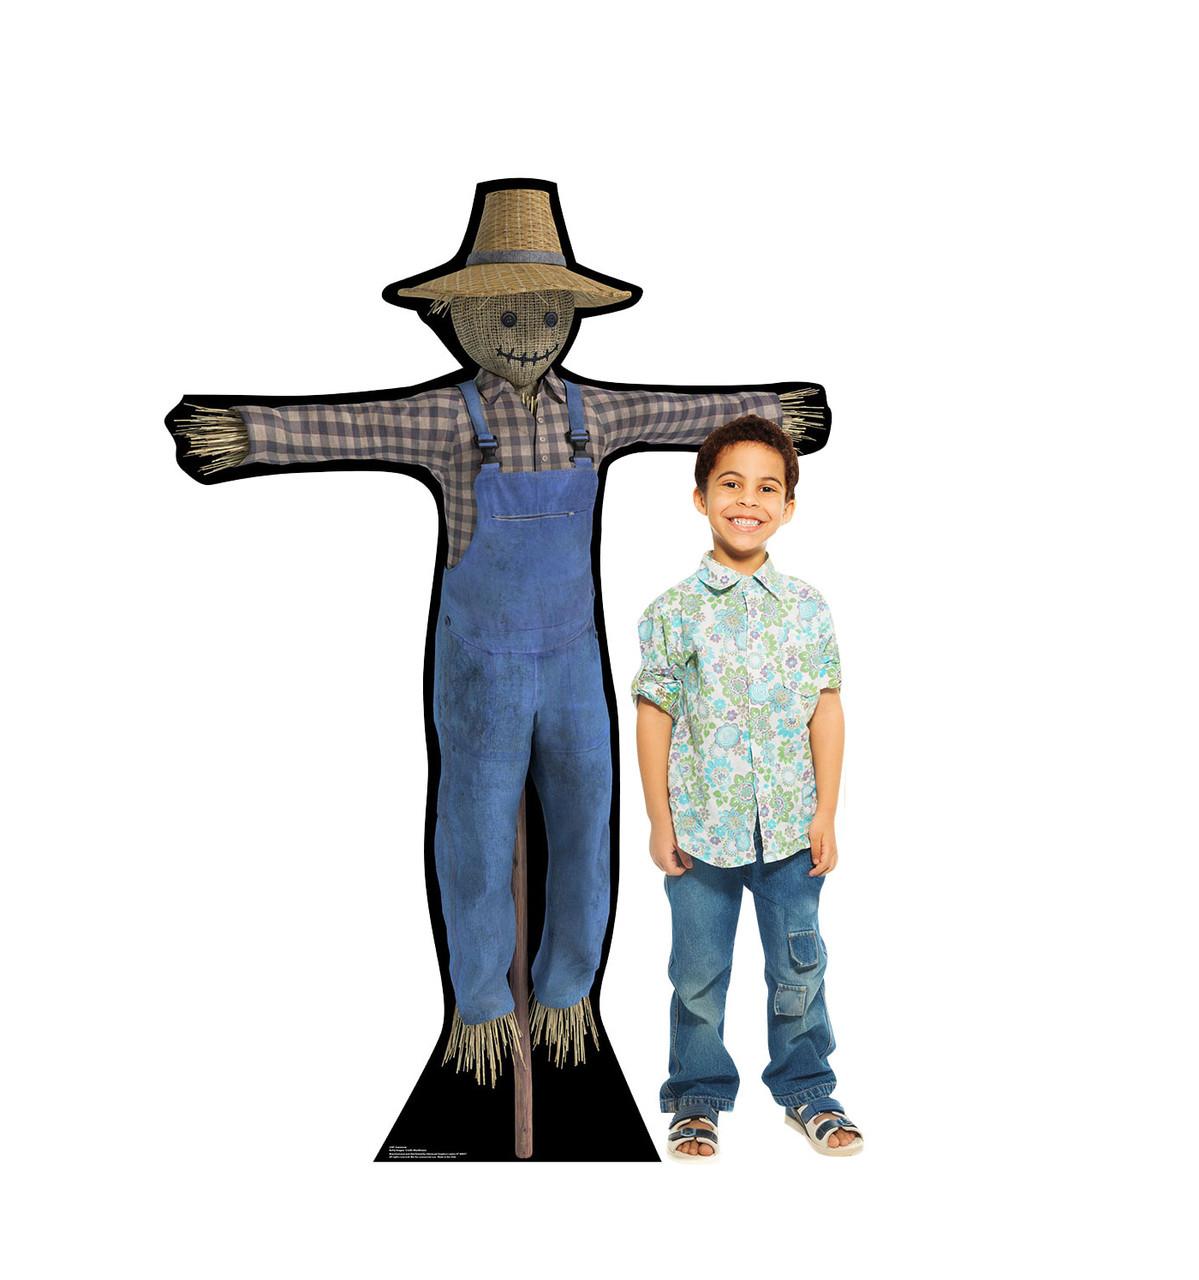 Life-size Scarecrow 1 Cardboard Standup | Cardboard Cutout 2